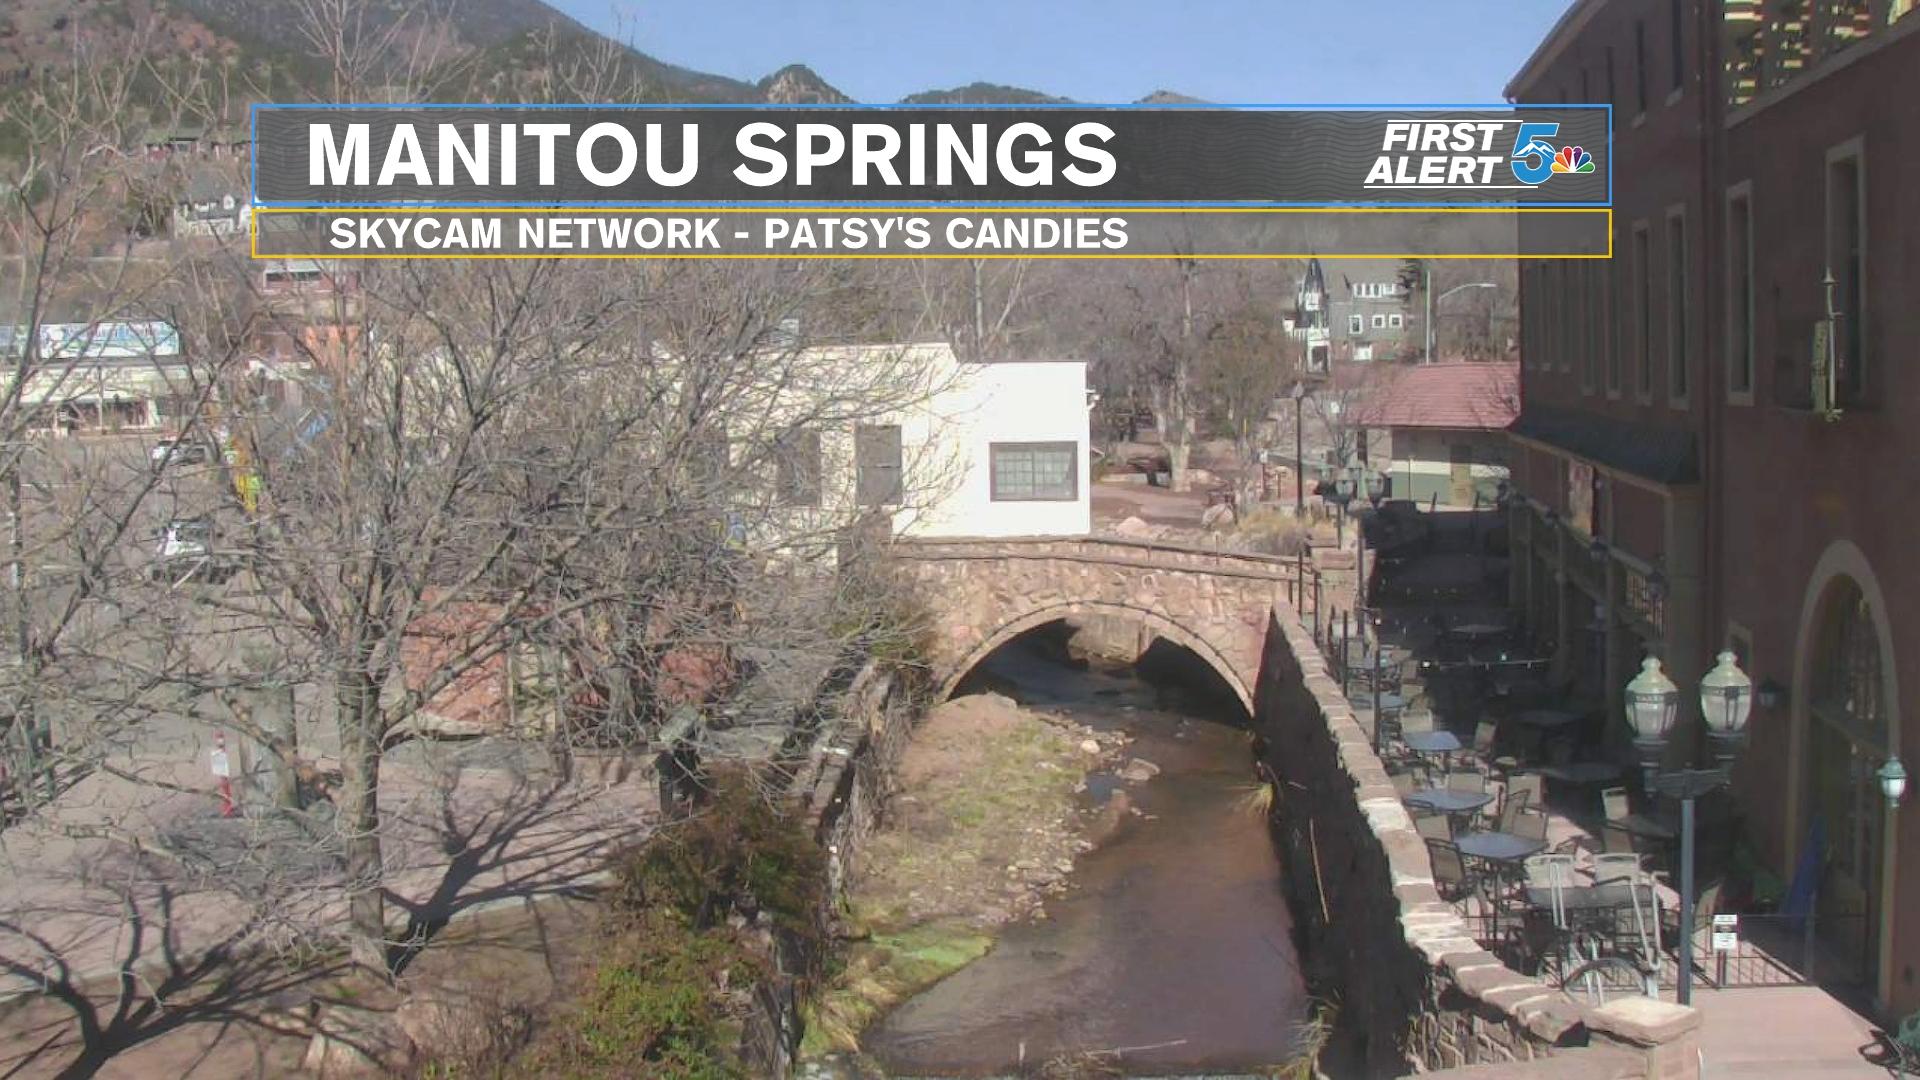 Manitou Springs